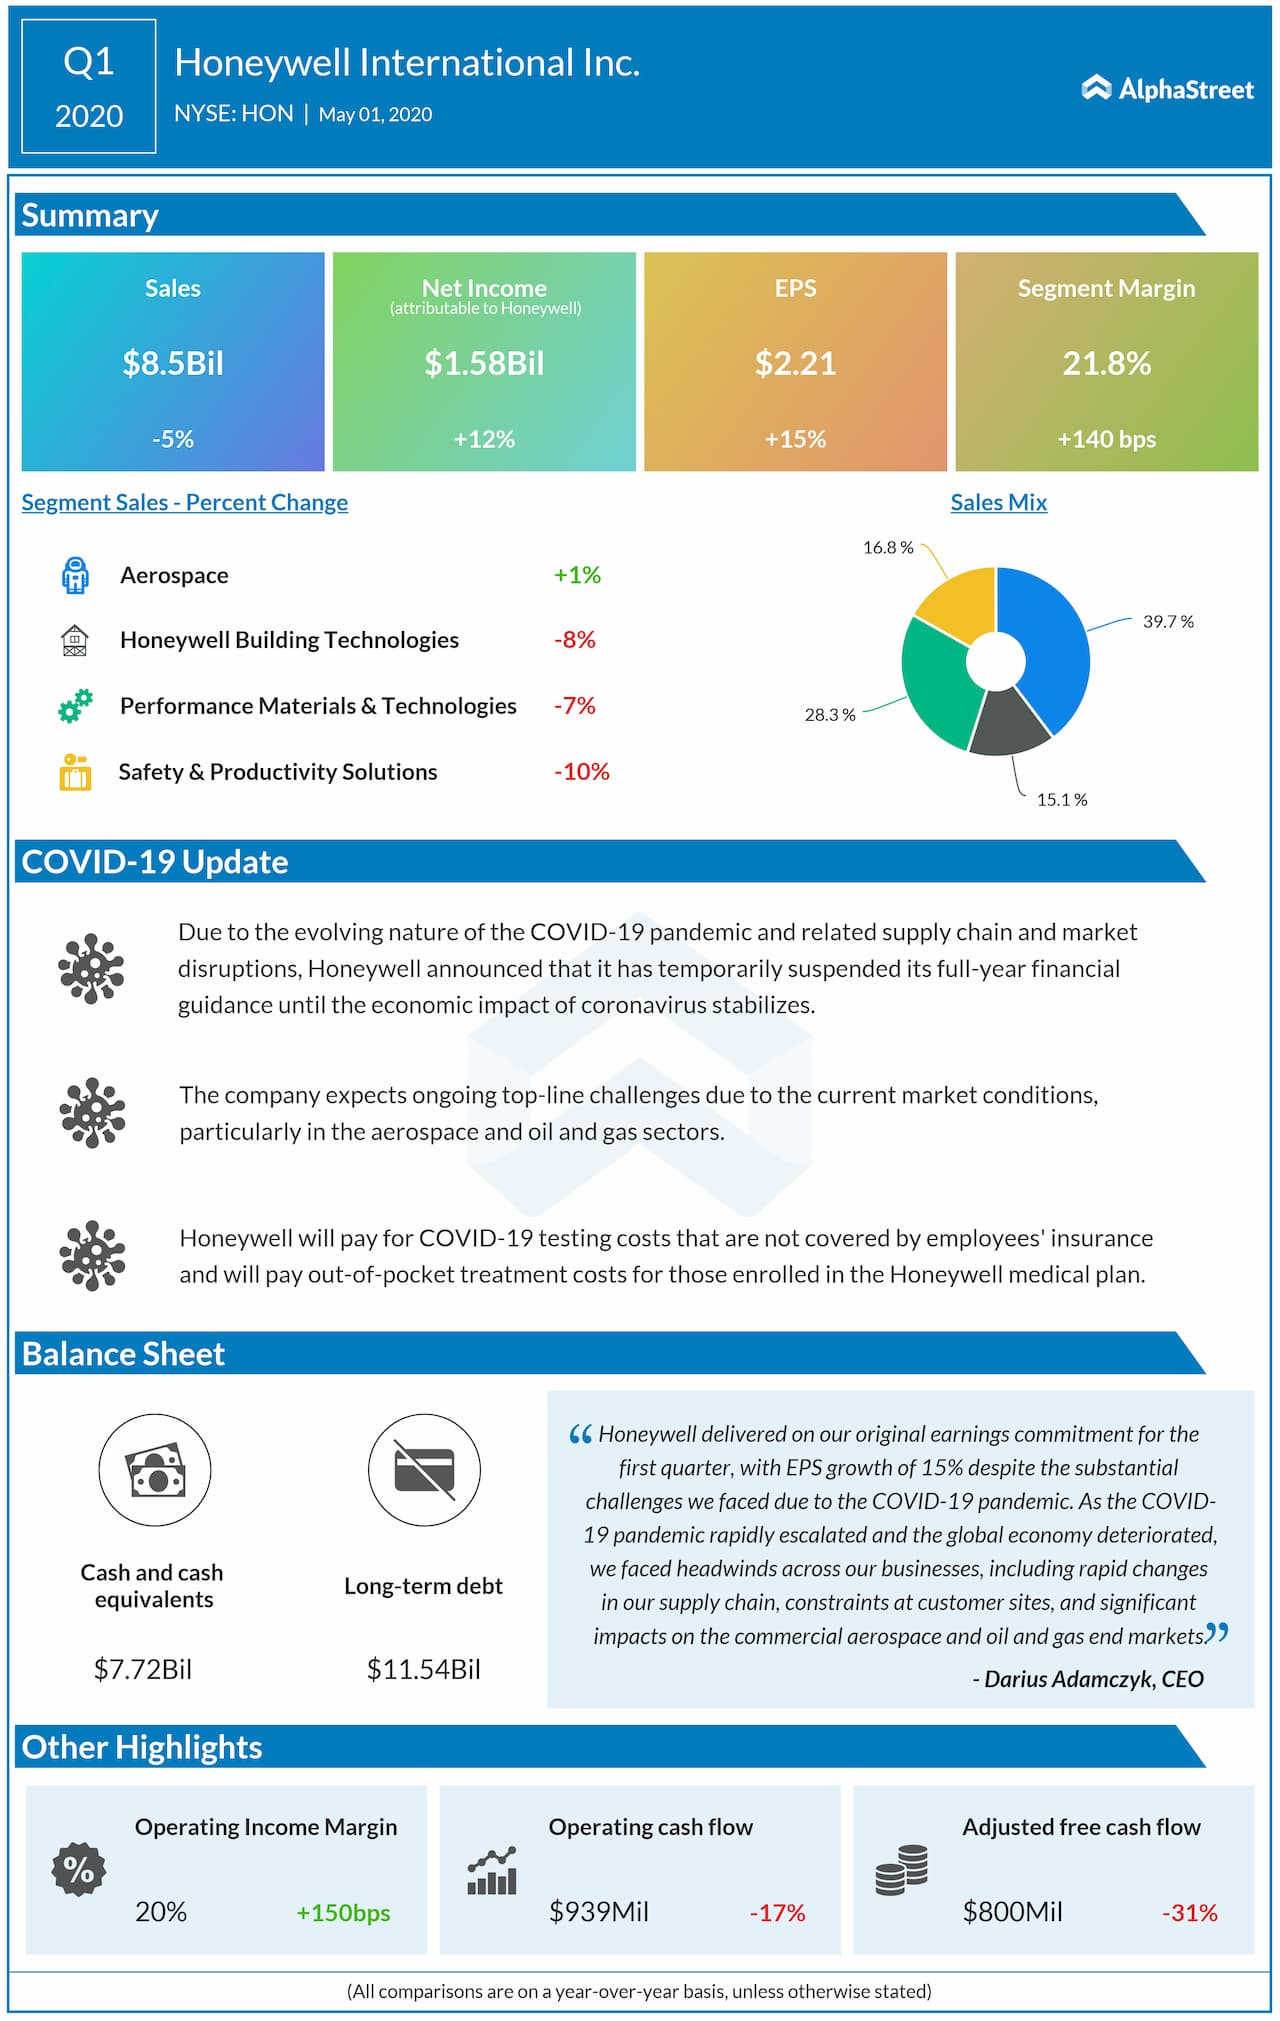 Honeywell International (HON) Q1 2020 earnings review